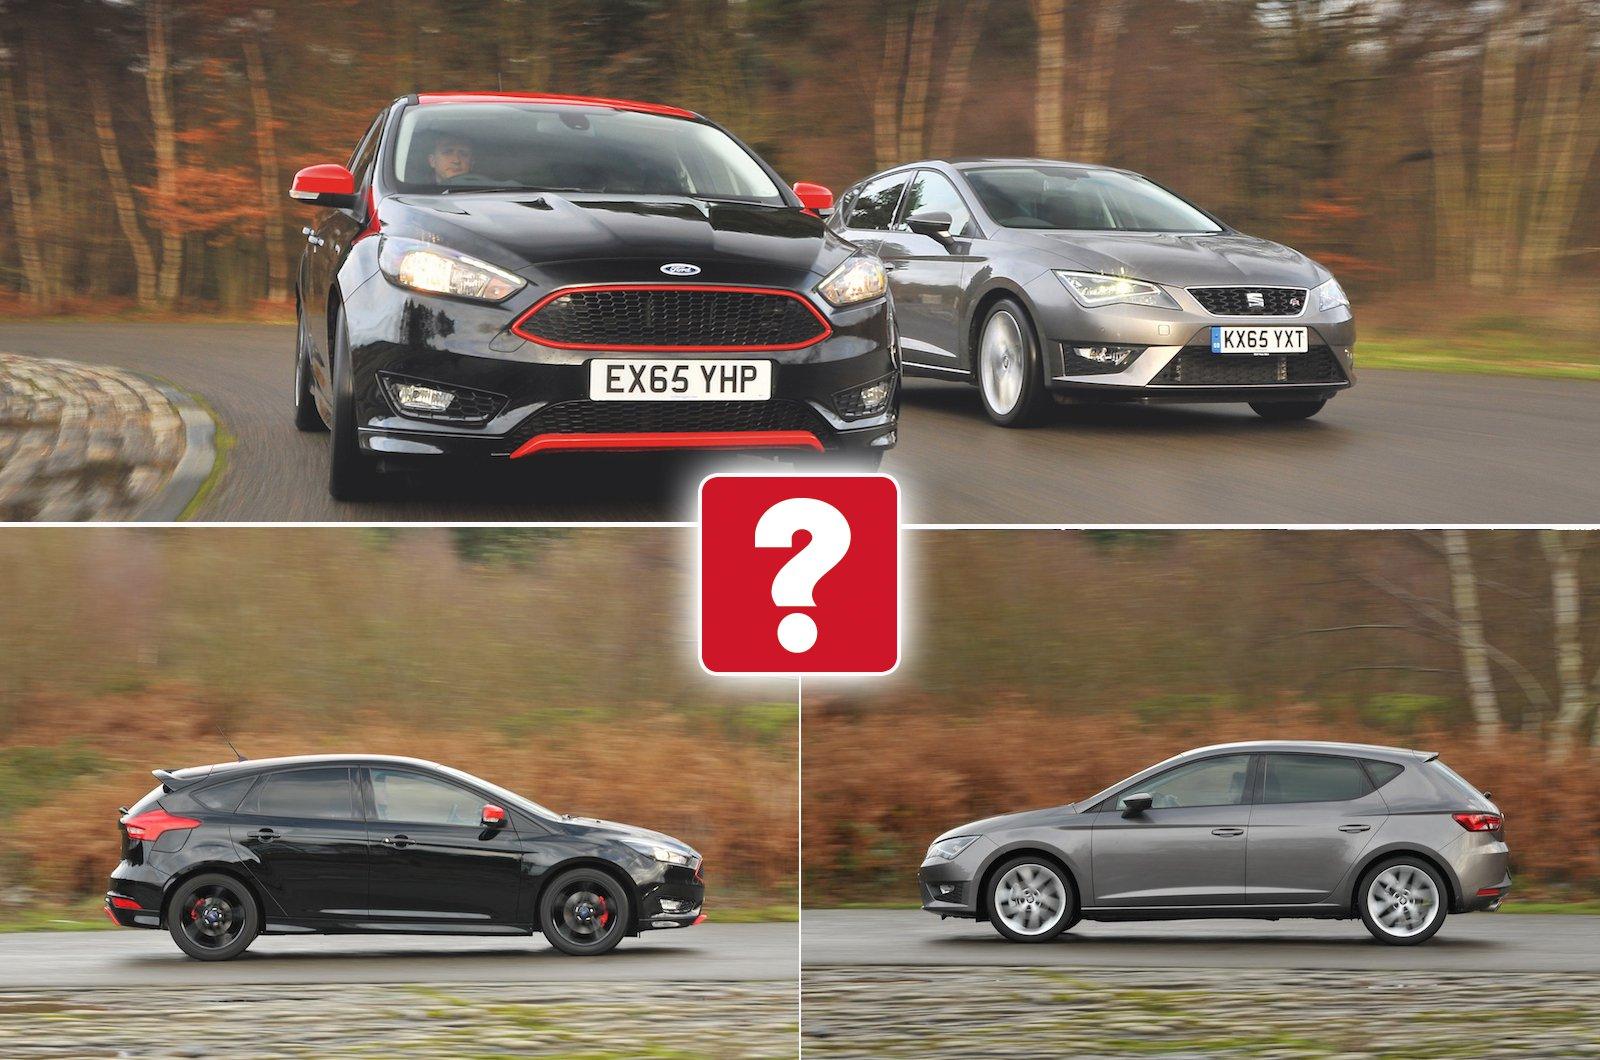 Used test: Ford Focus vs Seat Leon